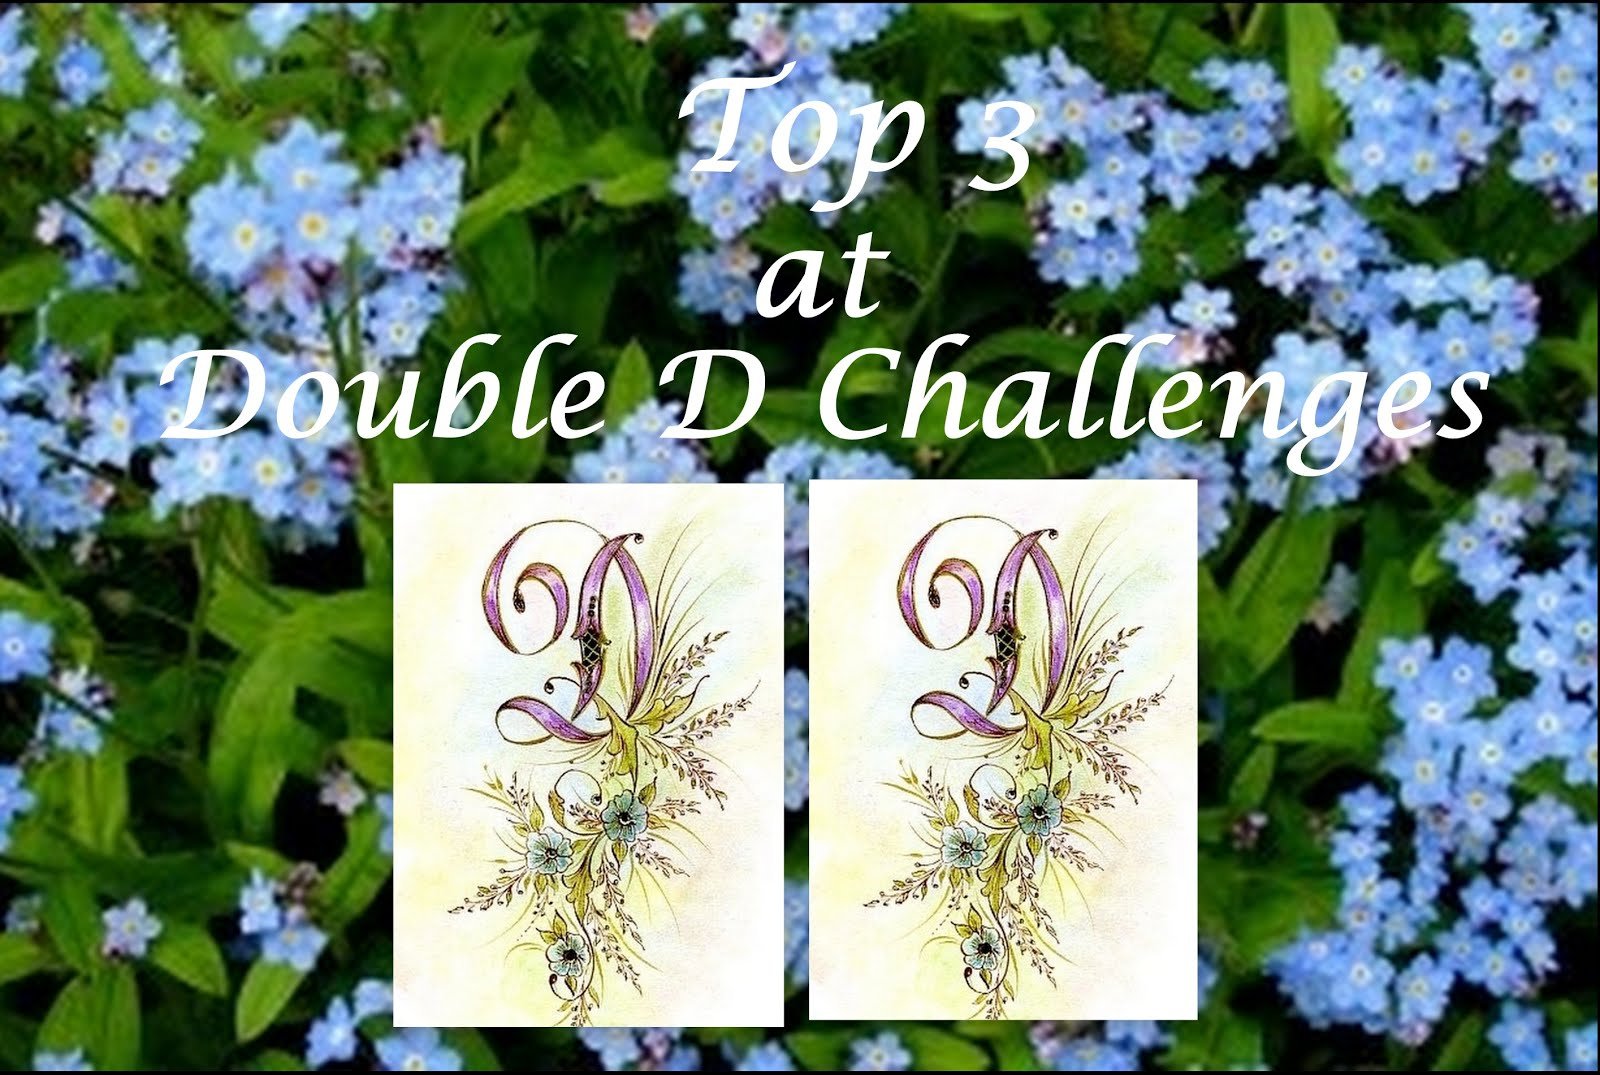 8 x Double D Top 3